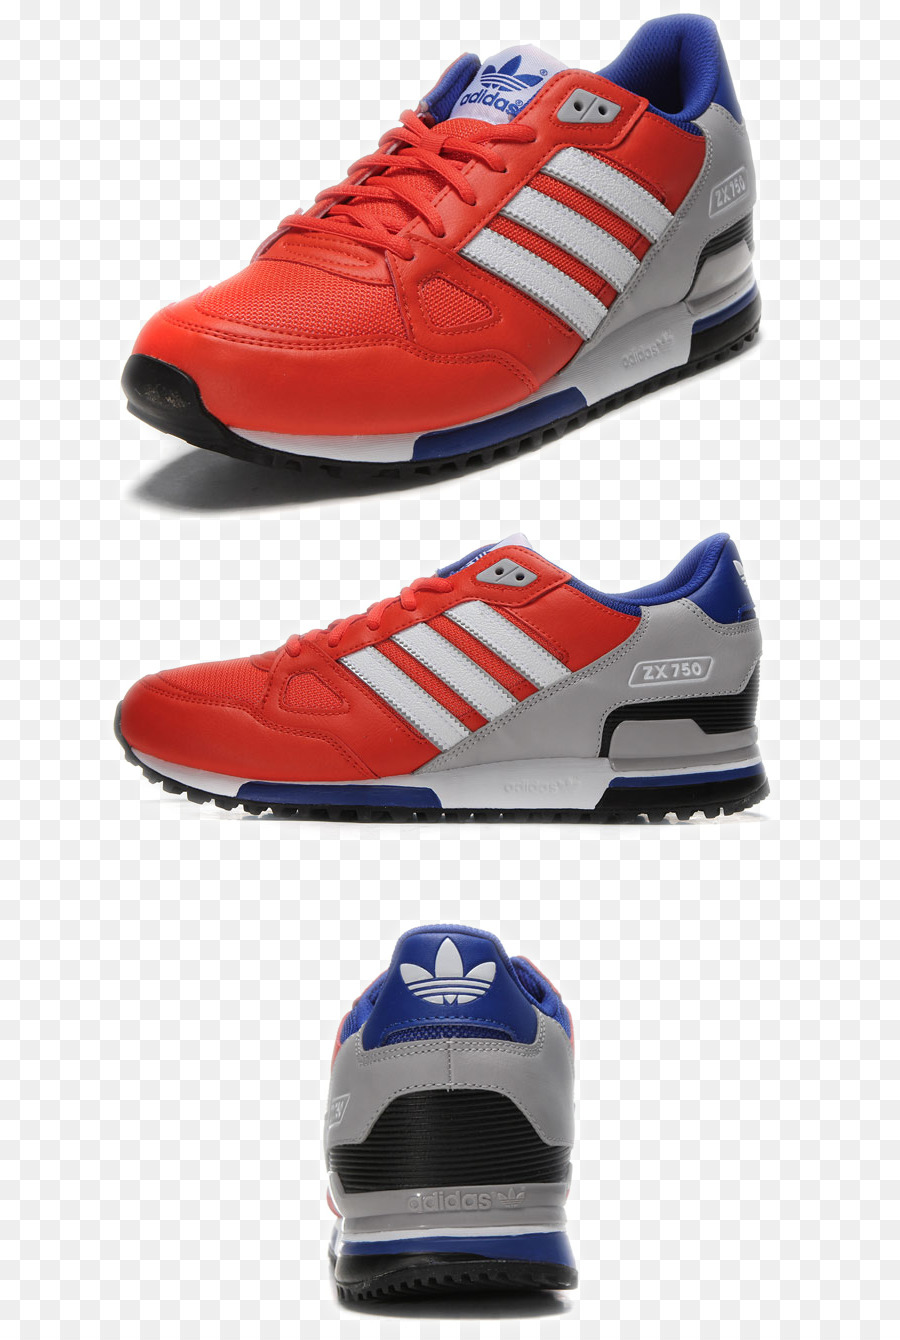 adidas originali scarpe pattinare scarpe adidas le adidas png